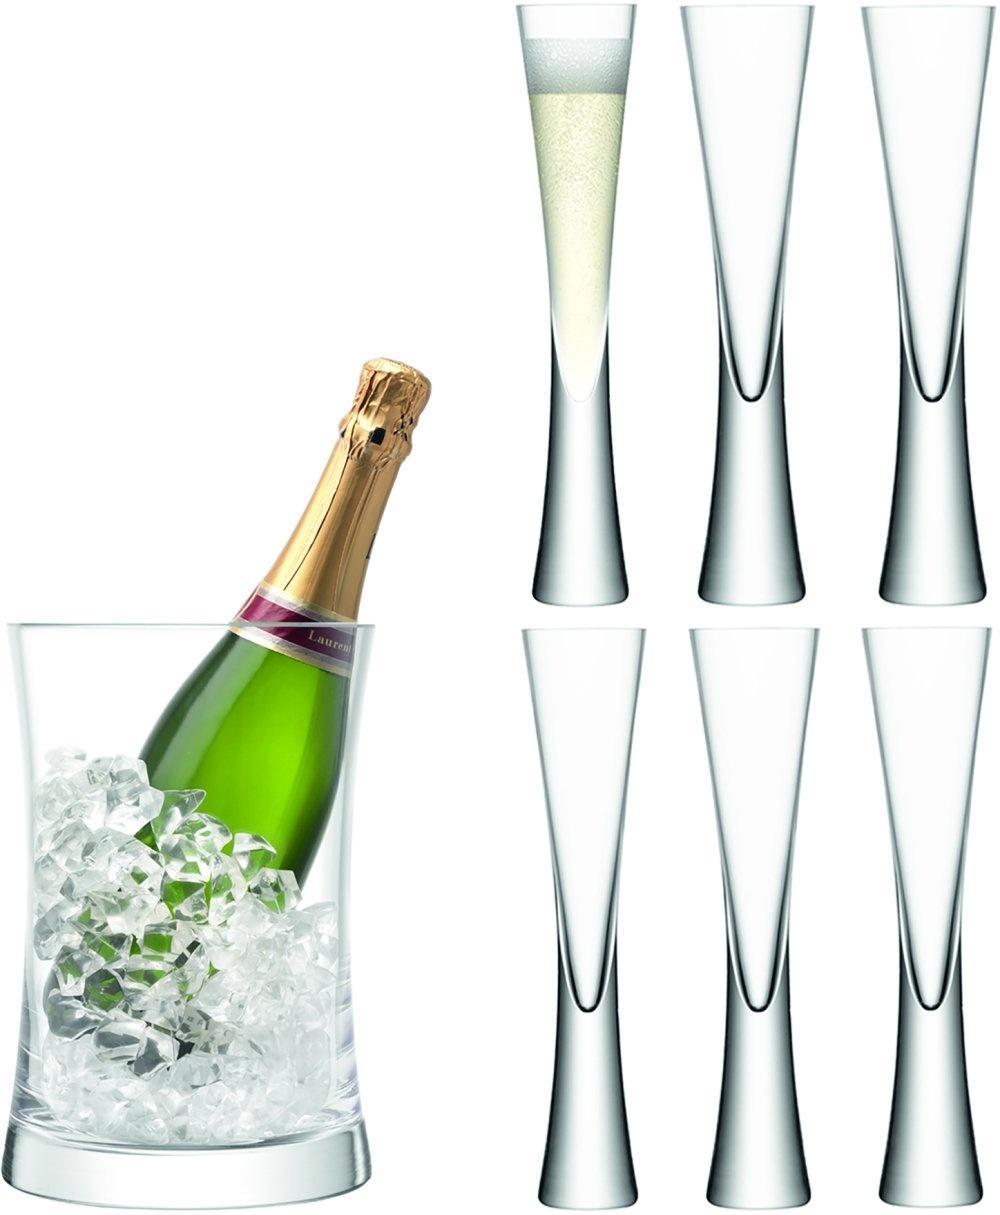 L.S.A. Moya Champagne Serveerset van 7 Stuks